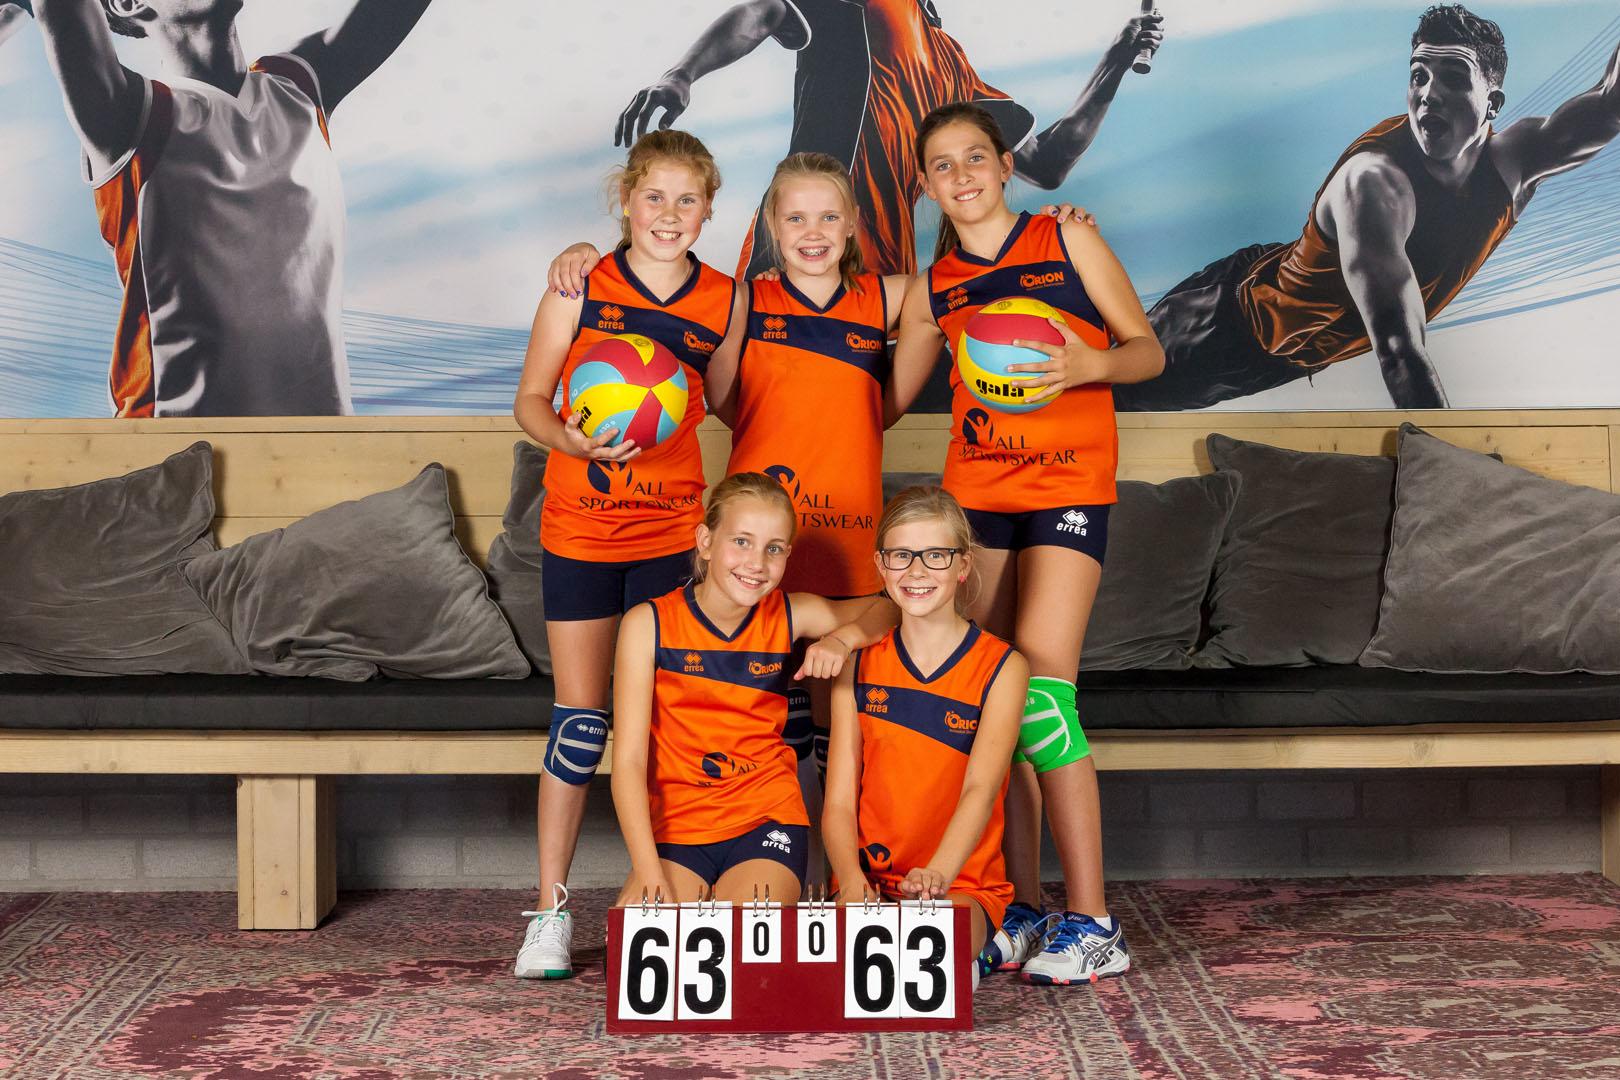 cmv-team-63